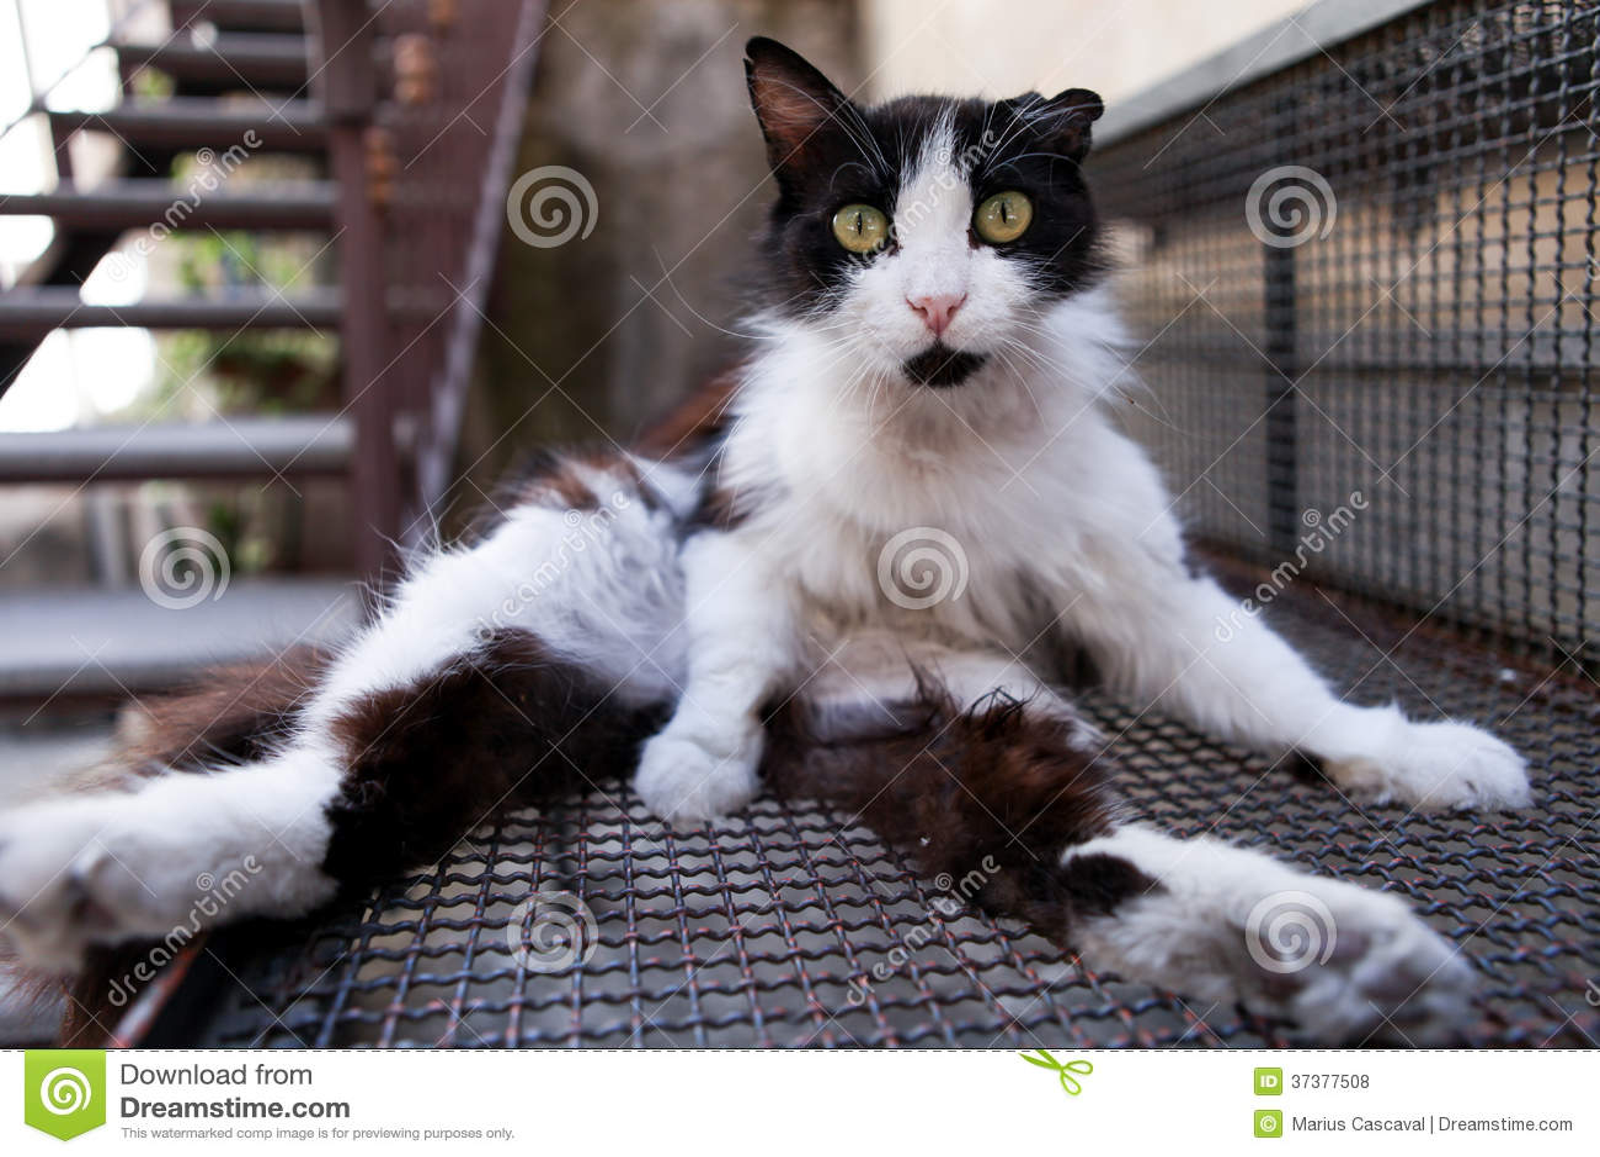 Strange Cat Royalty Free Stock Photos Image 37377508